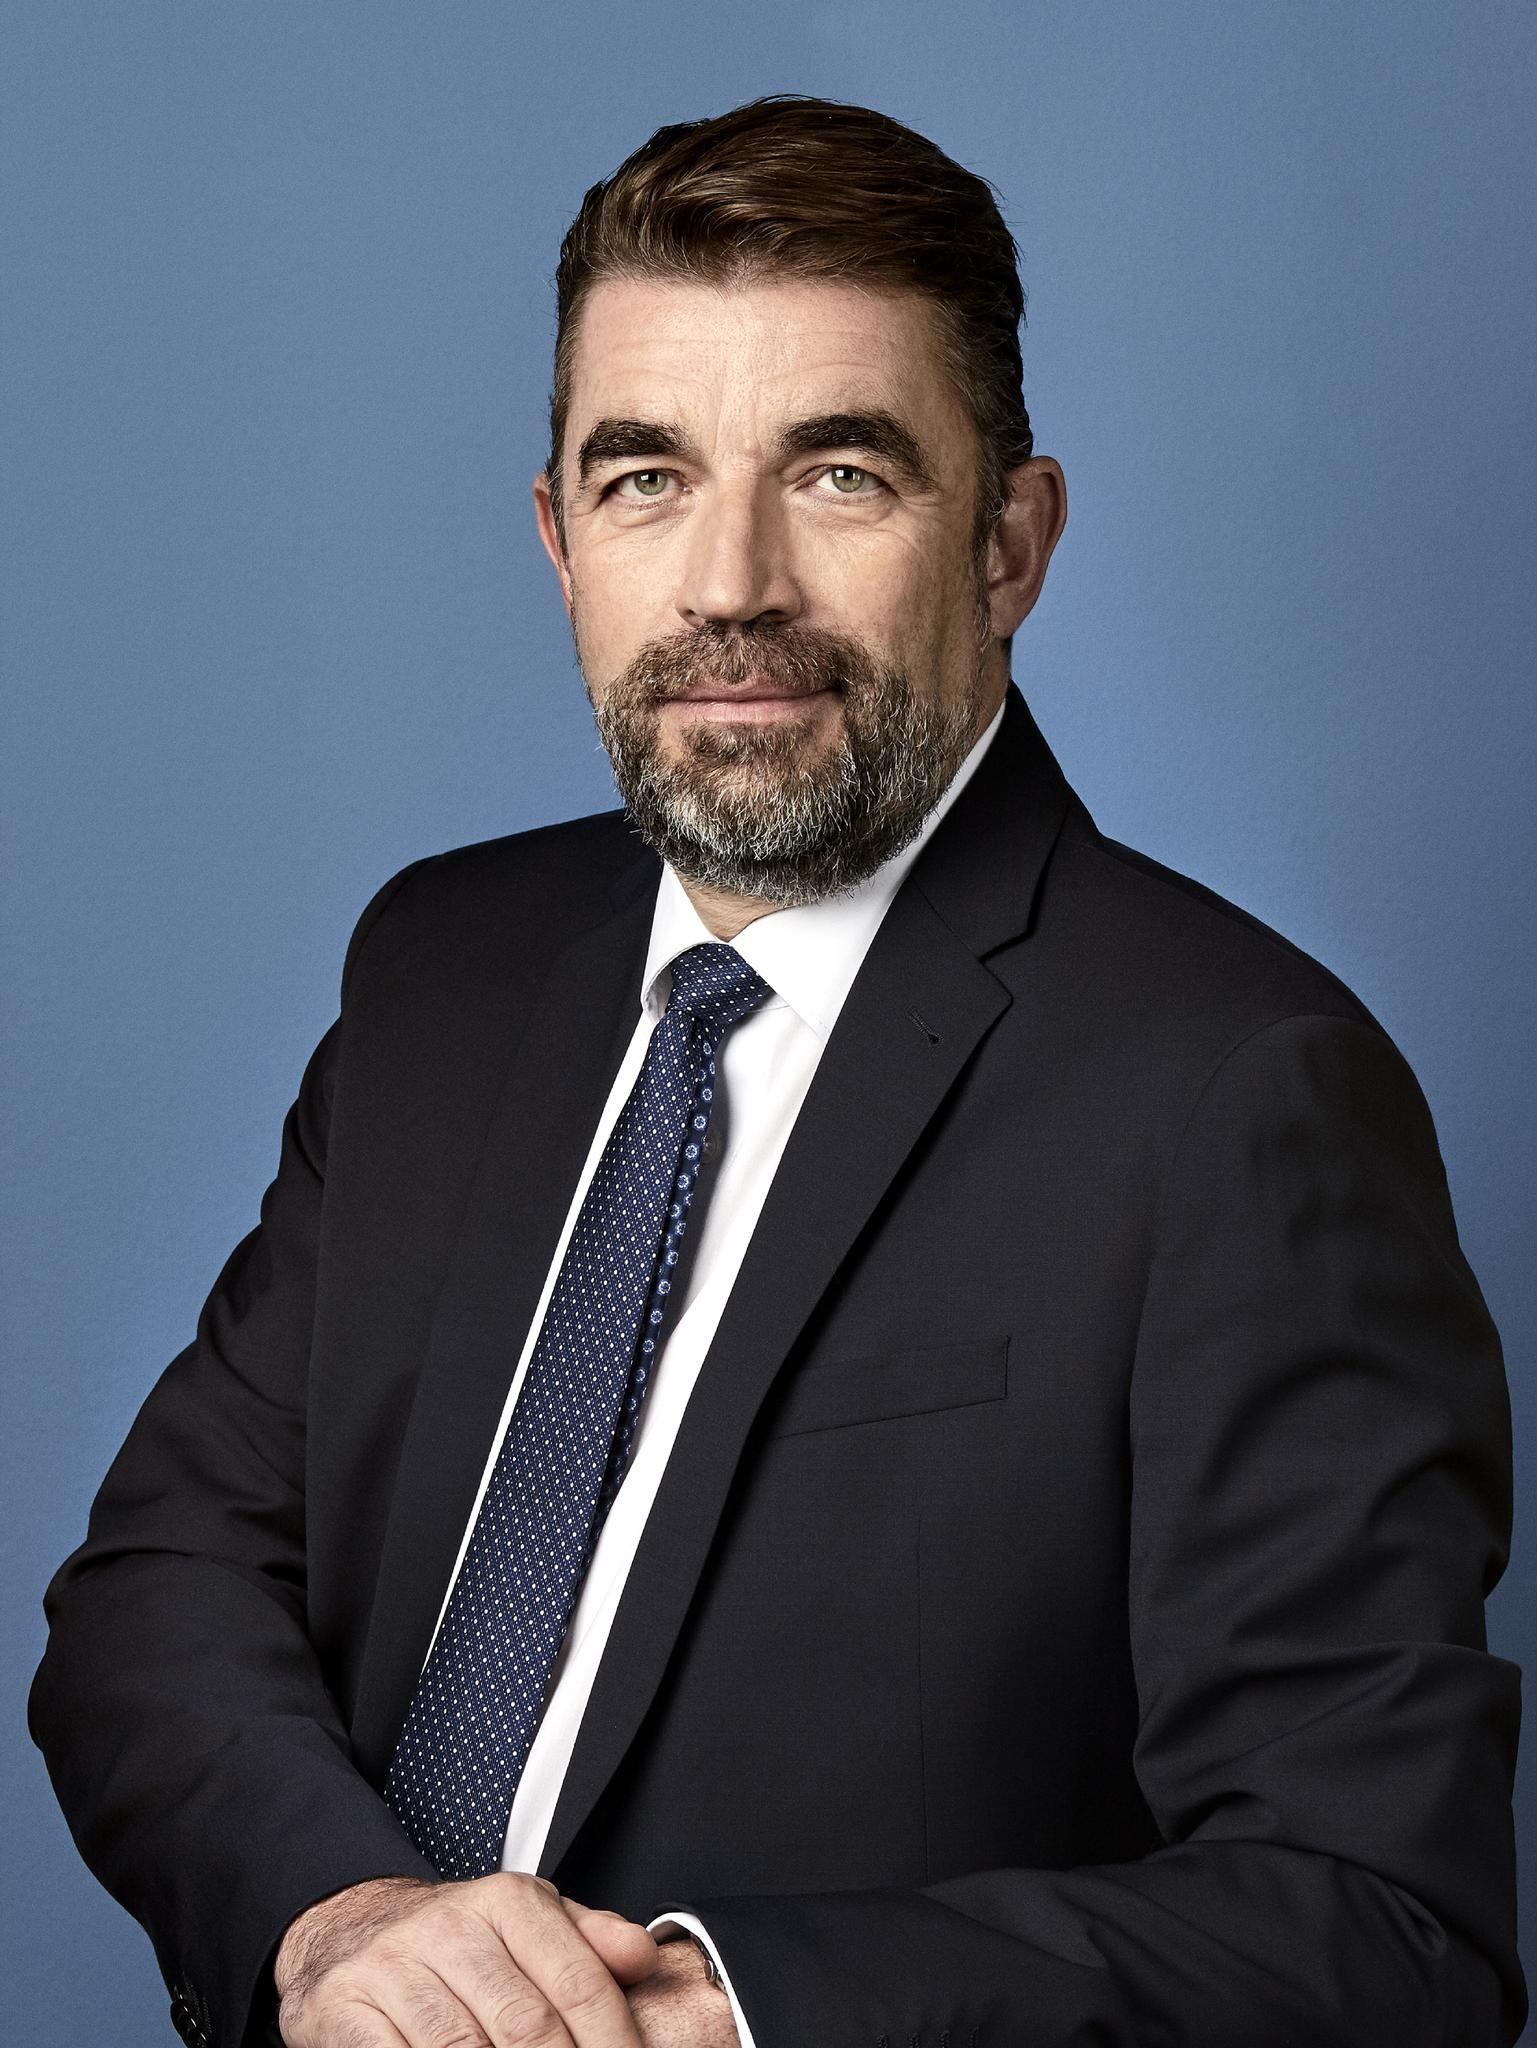 Mathias Dahms